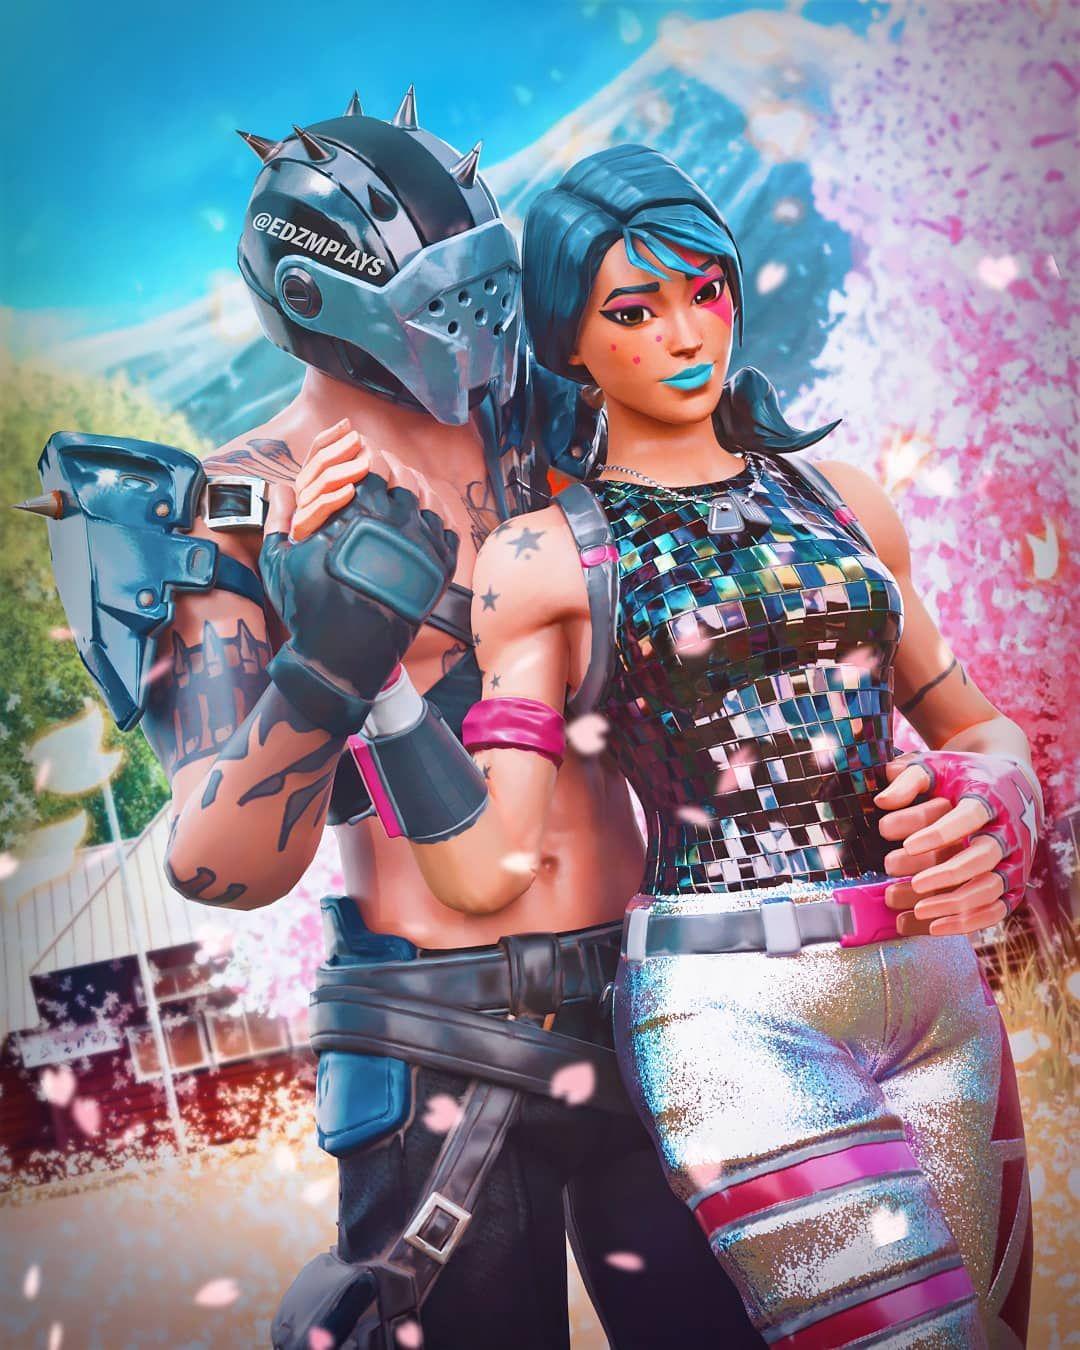 Edzmplays On Instagram Best Gaming Wallpapers Gaming Wallpapers Cute Art Styles